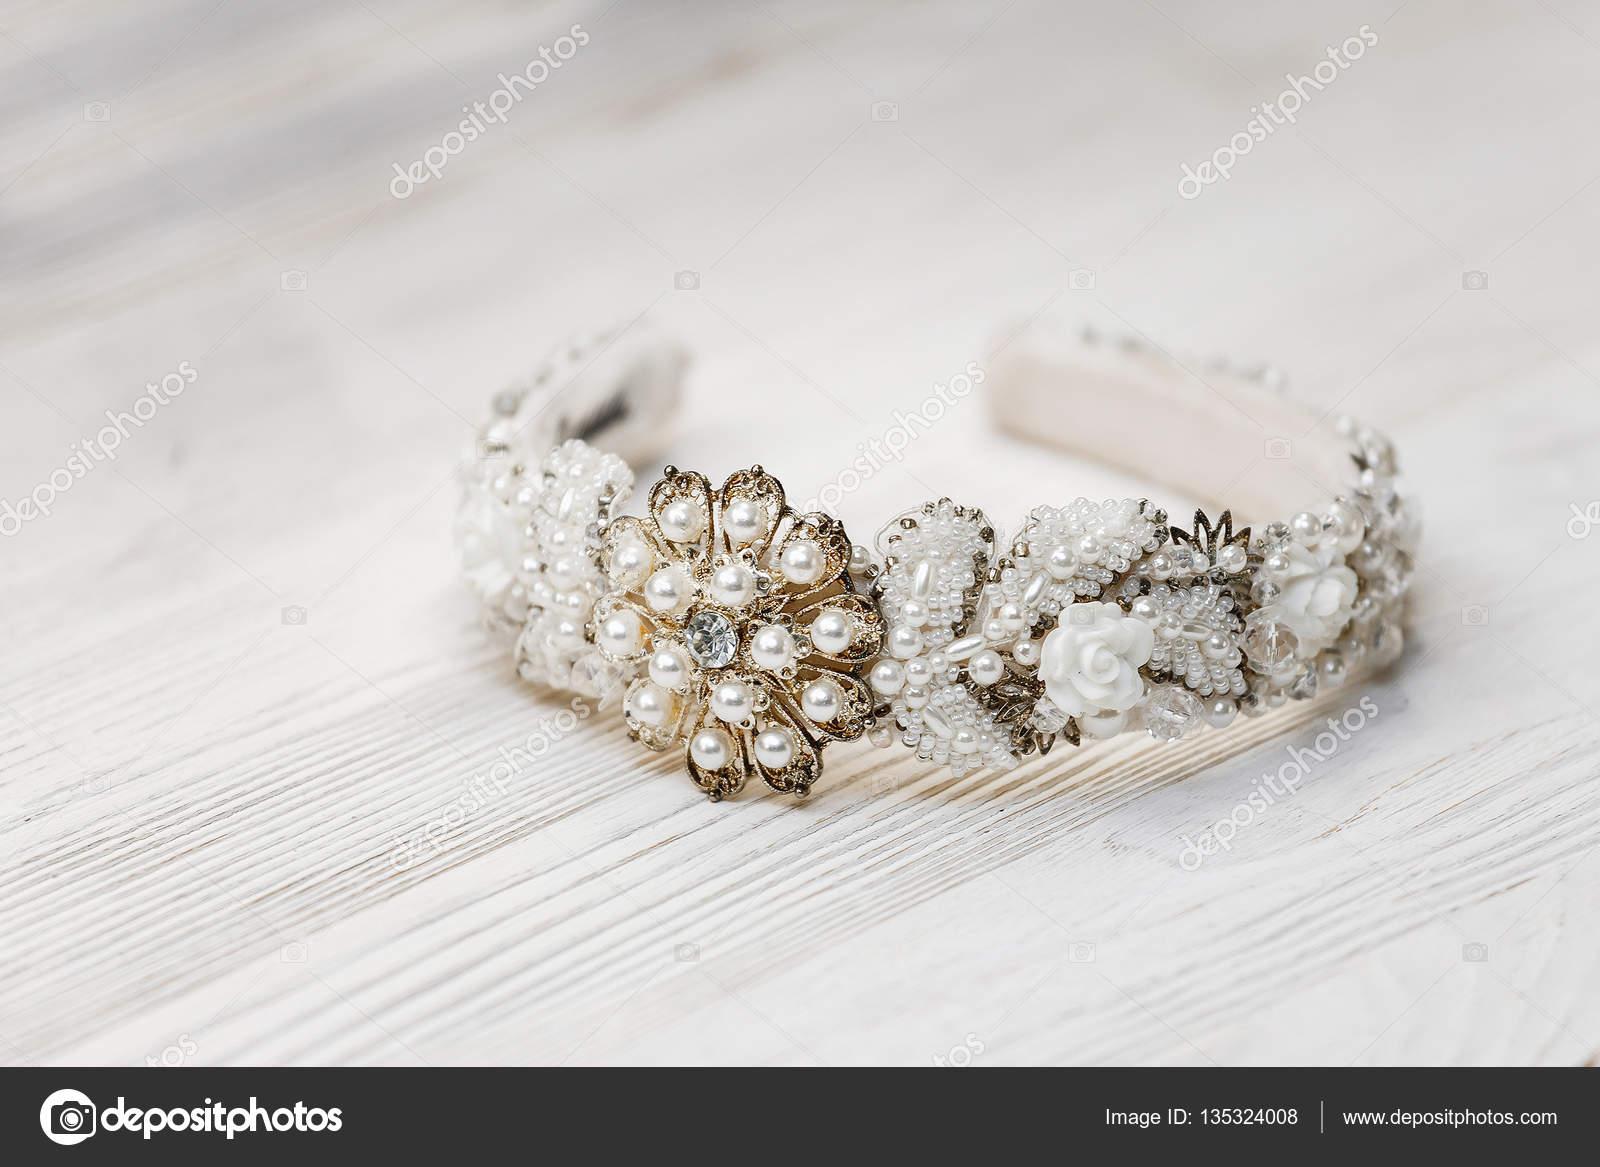 Luxury Jewelry Handmade Tiara With White Stones Crystals And